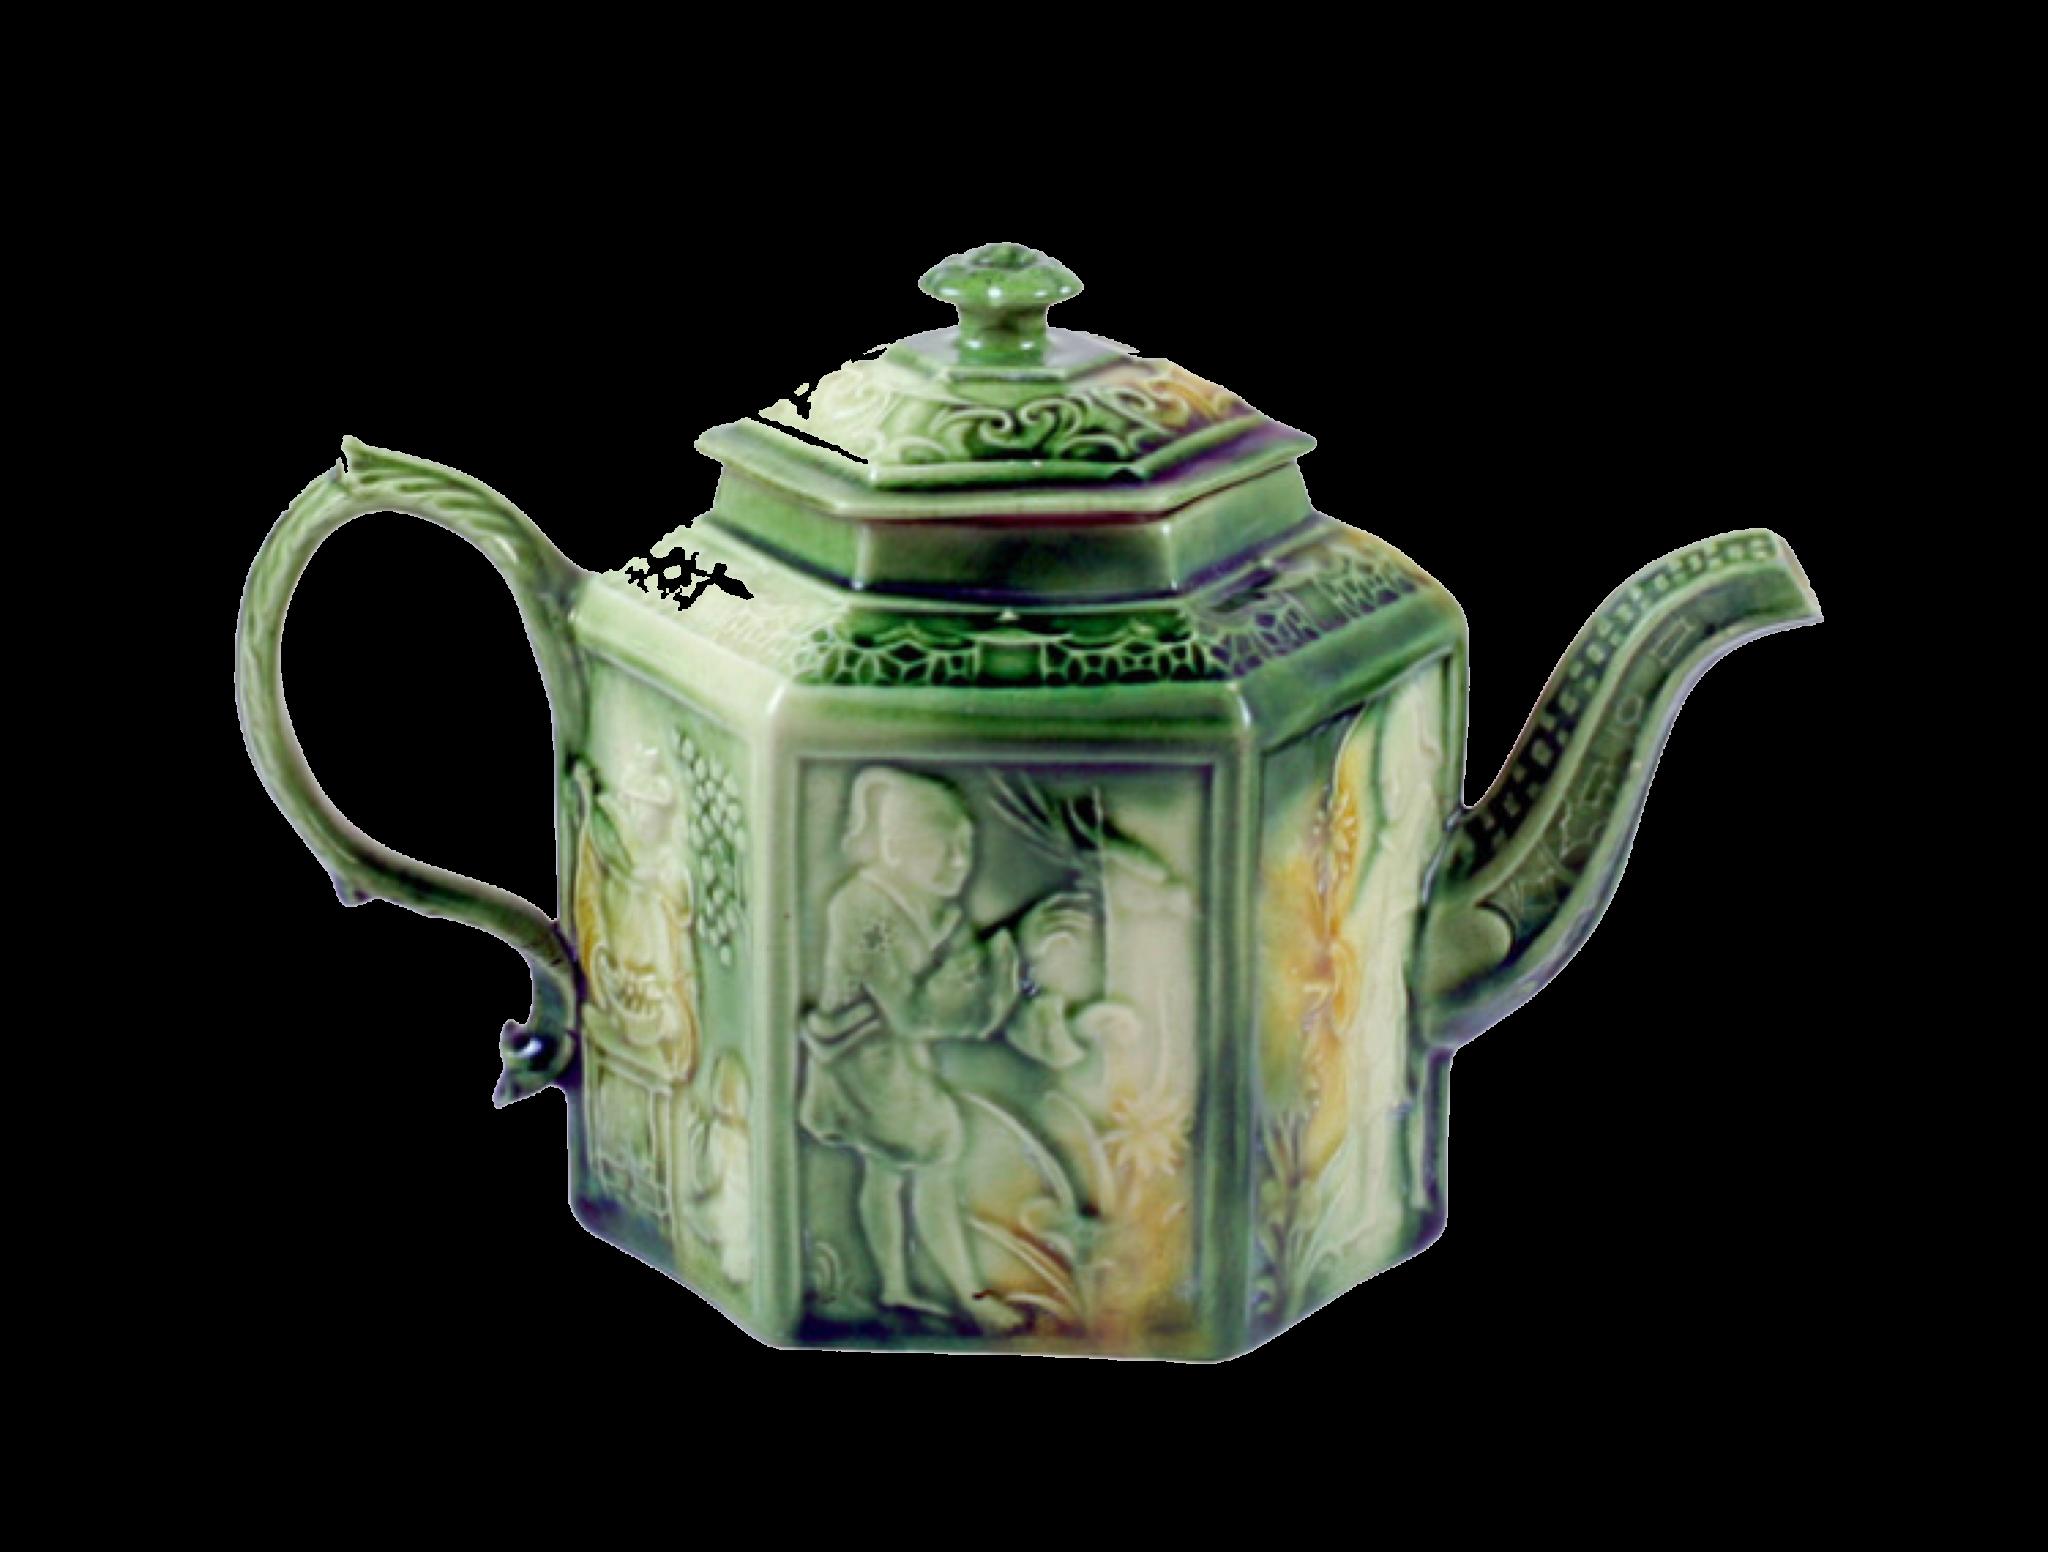 Green Jade Teapot Png Filler Moodboard Tea Pots Asian Tea Wedgwood